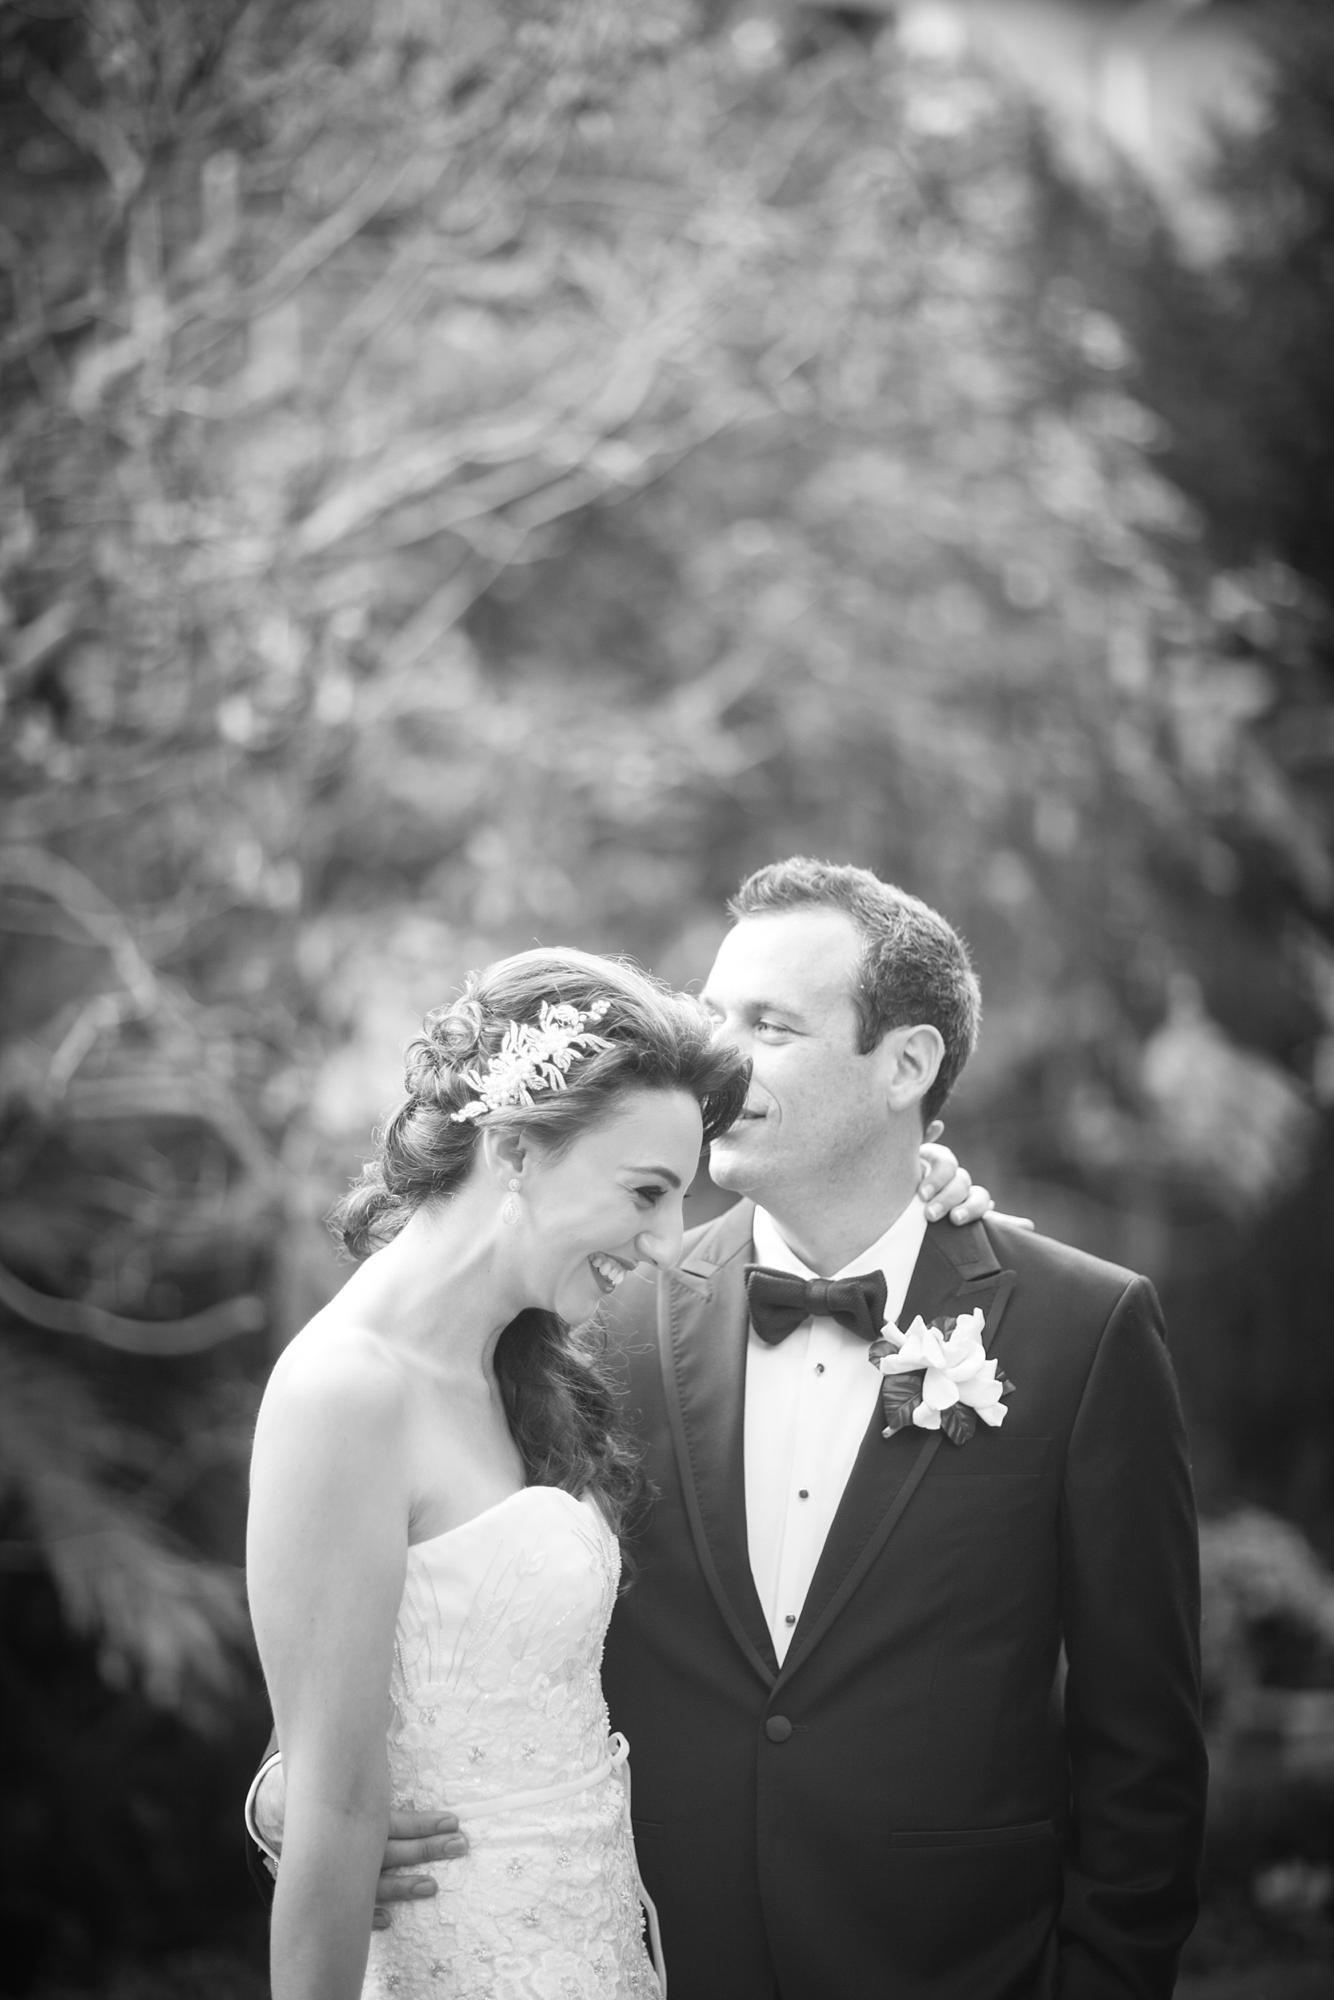 Beverly Hills Hotel Wedding   Miki & Sonja Photography   mikiandsonja.com